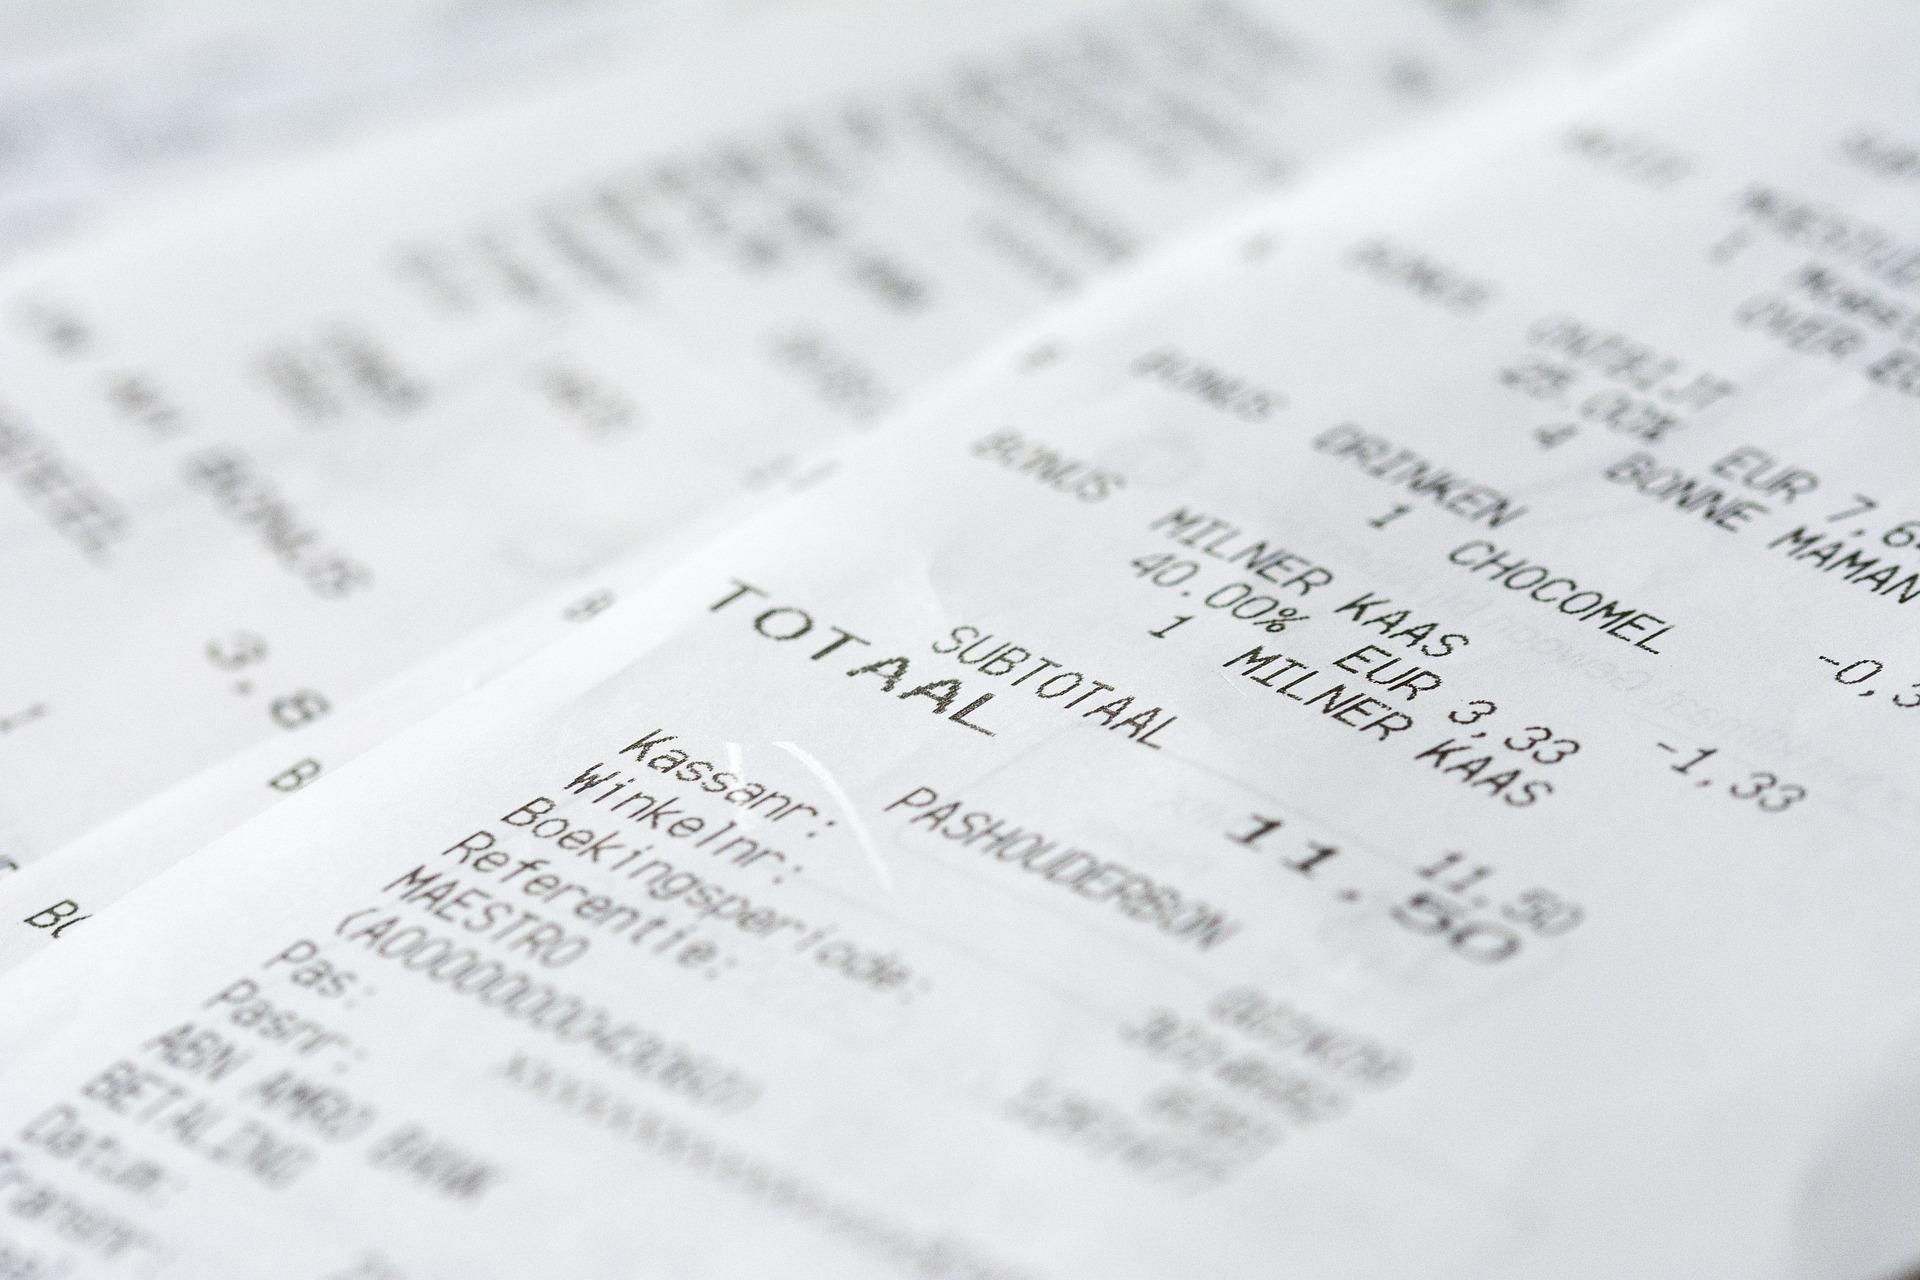 receipt-1274307_1920.jpg